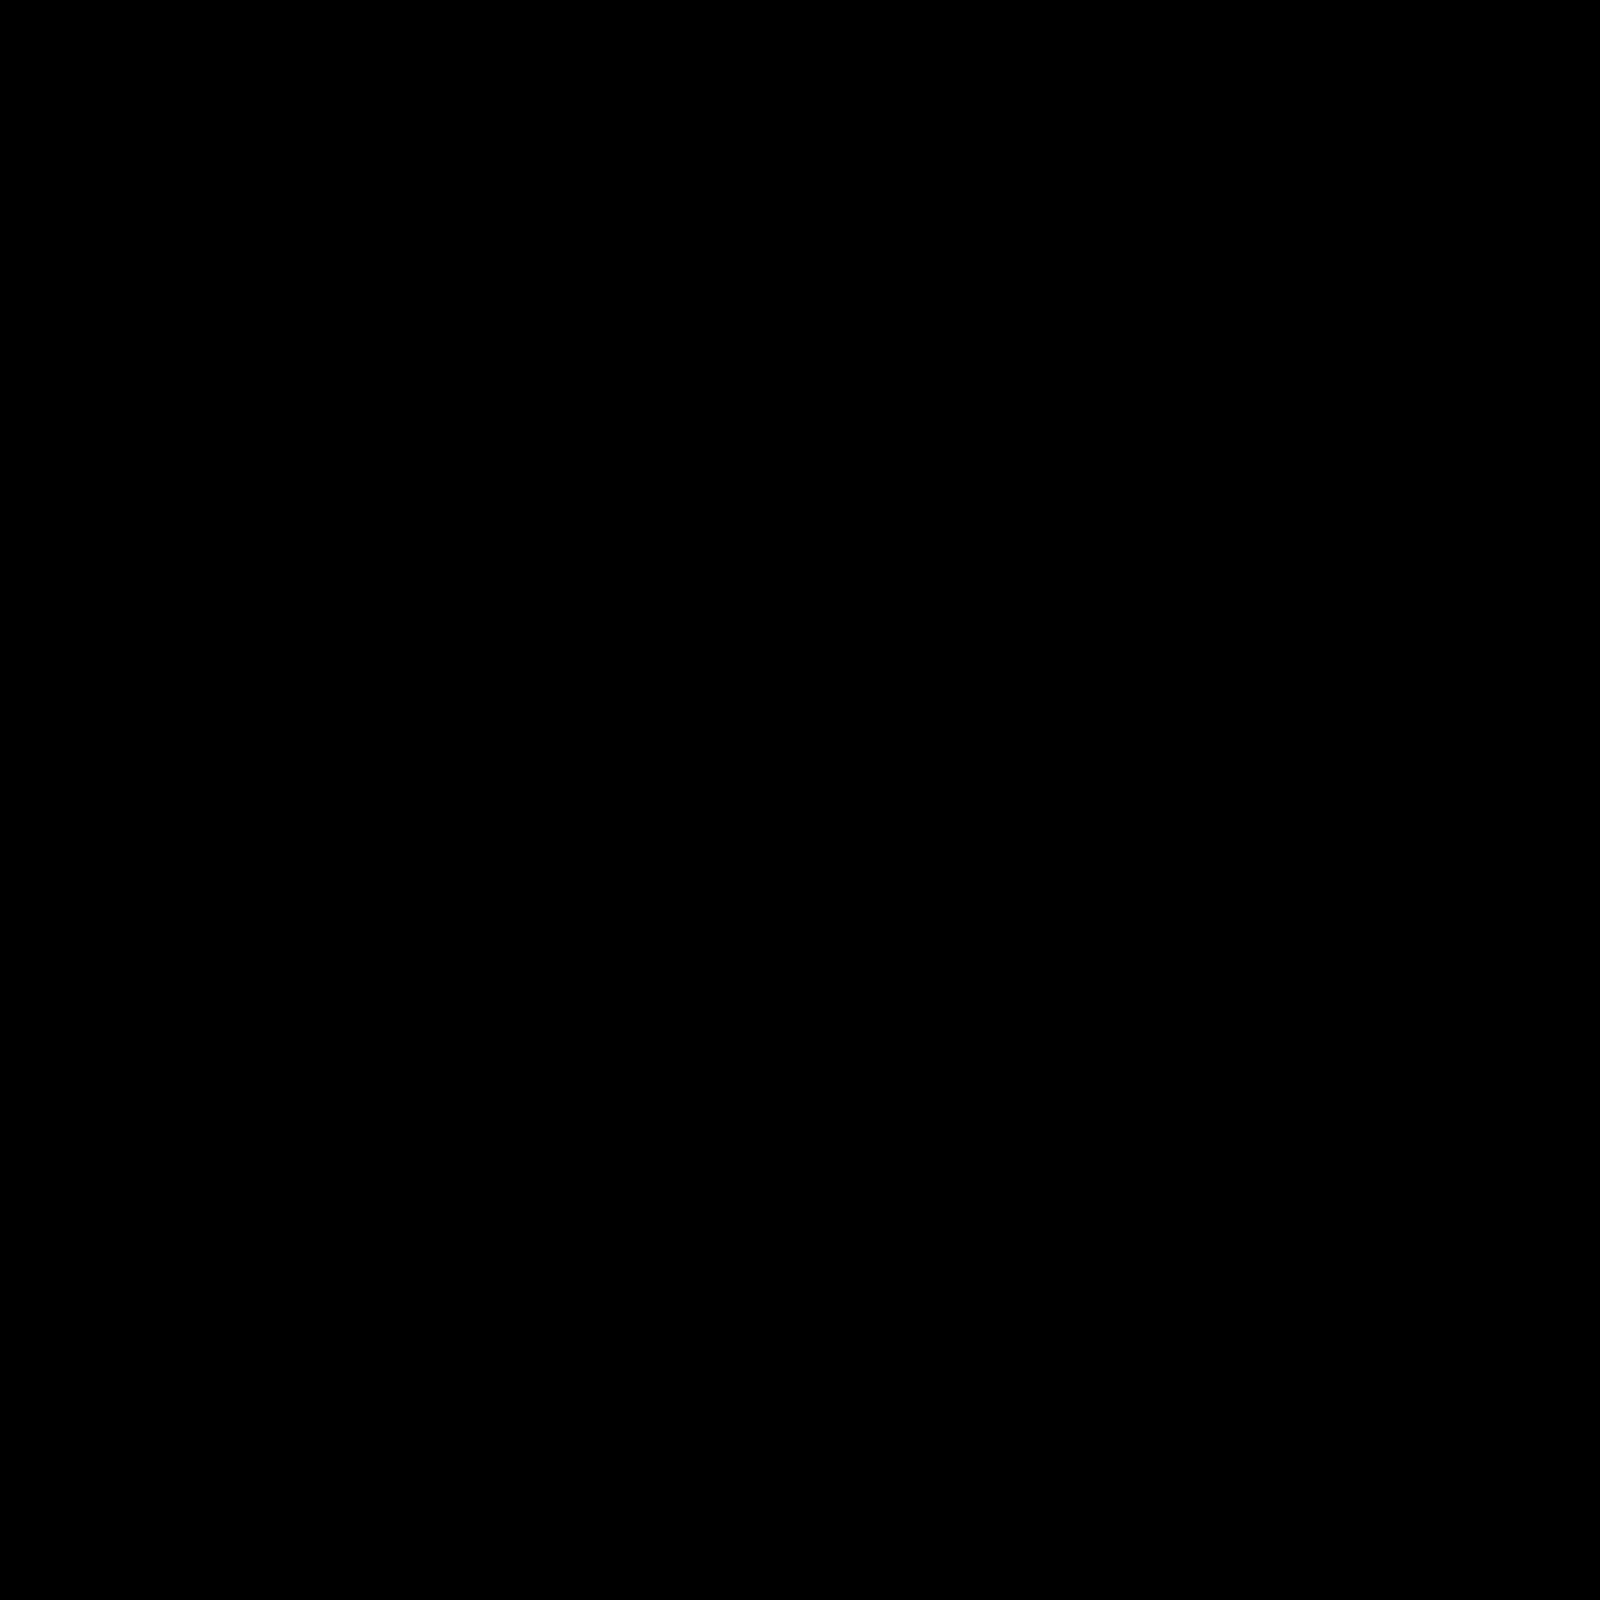 Lampa uliczna icon